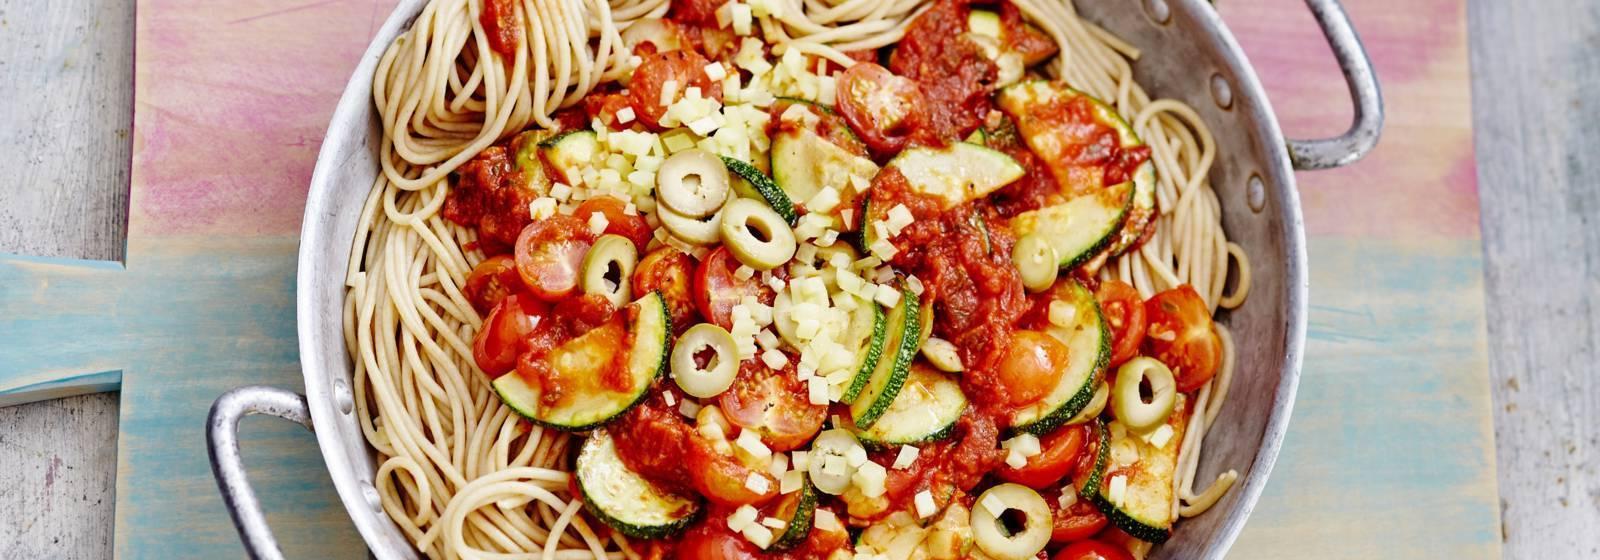 Spaghetti with tomato sauce and zucchini